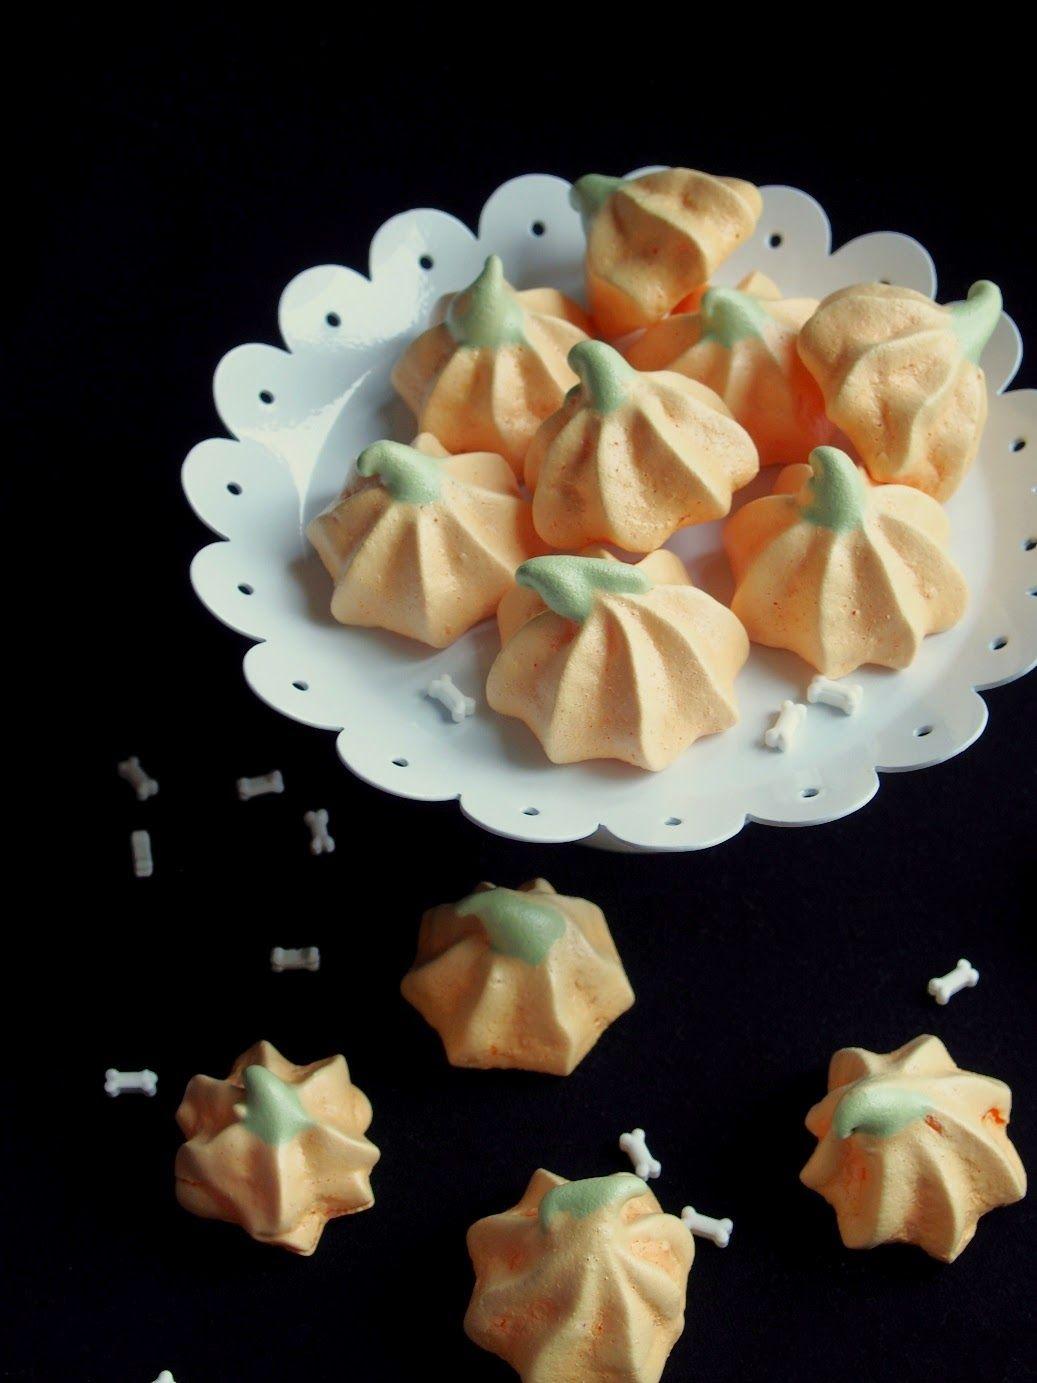 http://drsugars.blogspot.fi/2014/10/kurpitsa-marengit-pumpkin-meringues.html